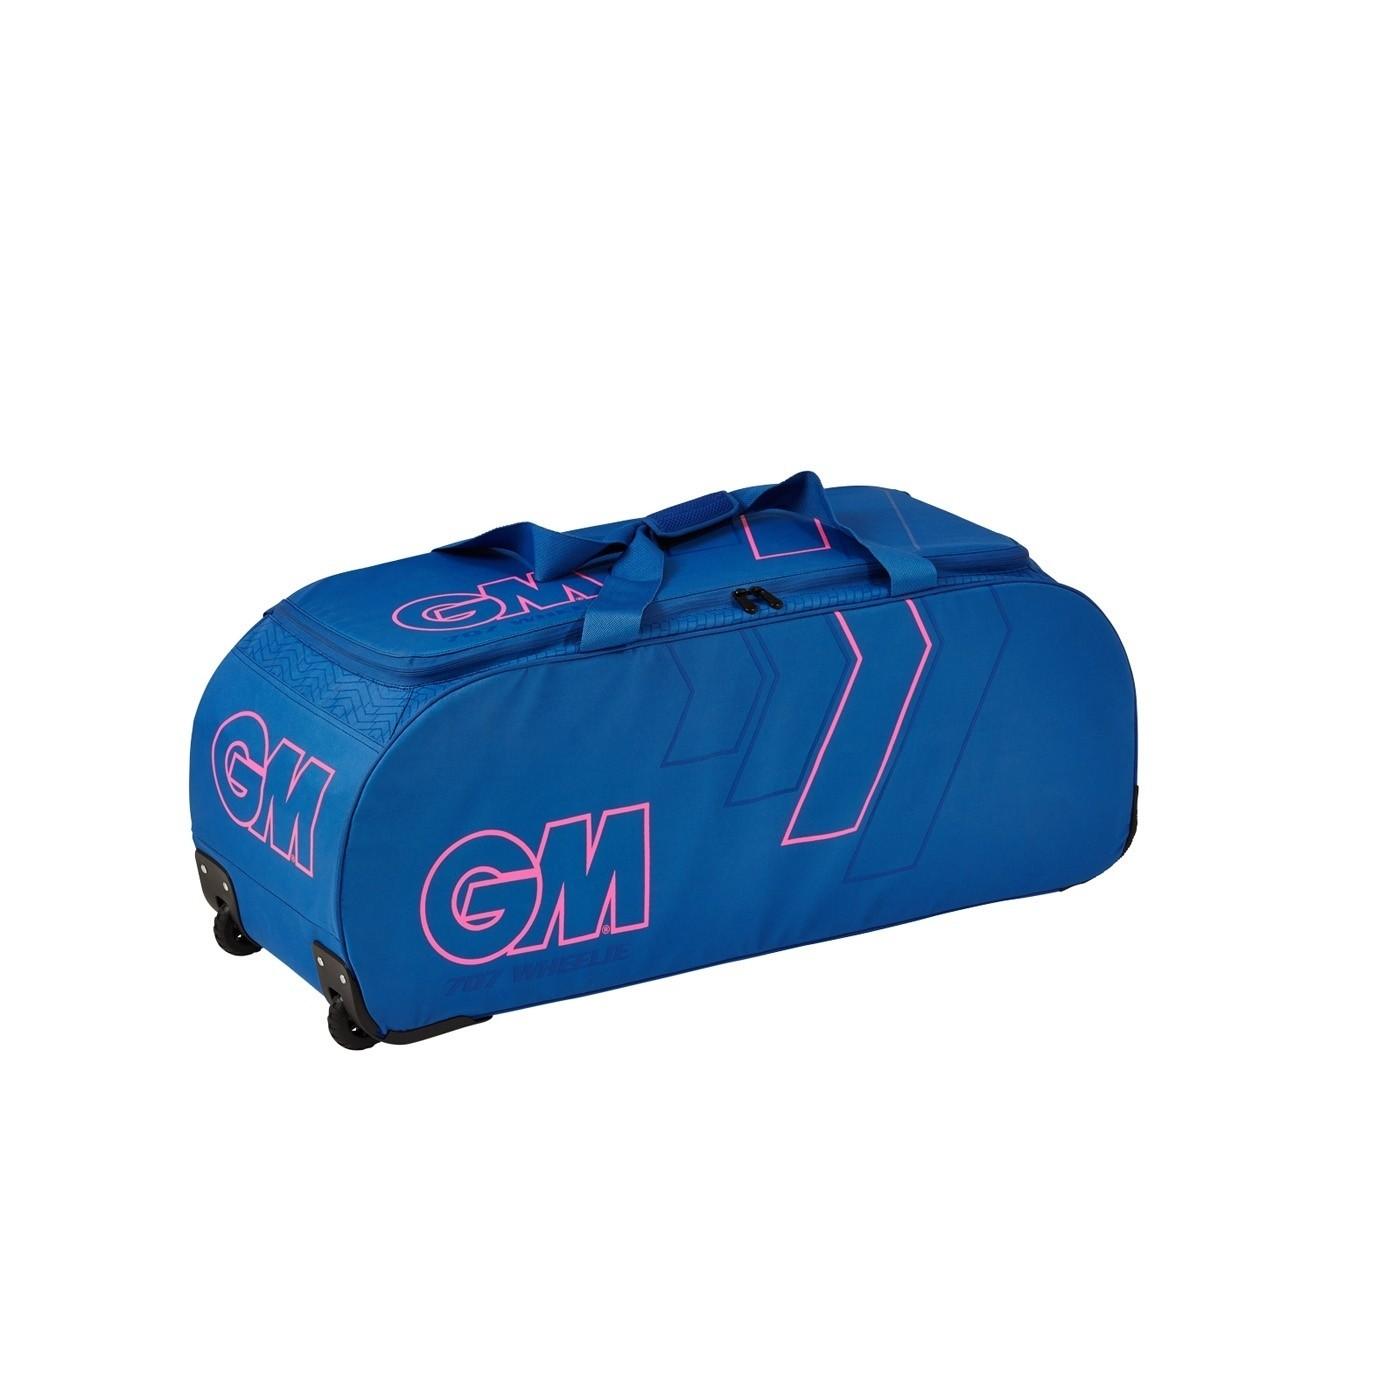 2021 Gunn and Moore 707 Wheelie Cricket Bag - Blue/Pink